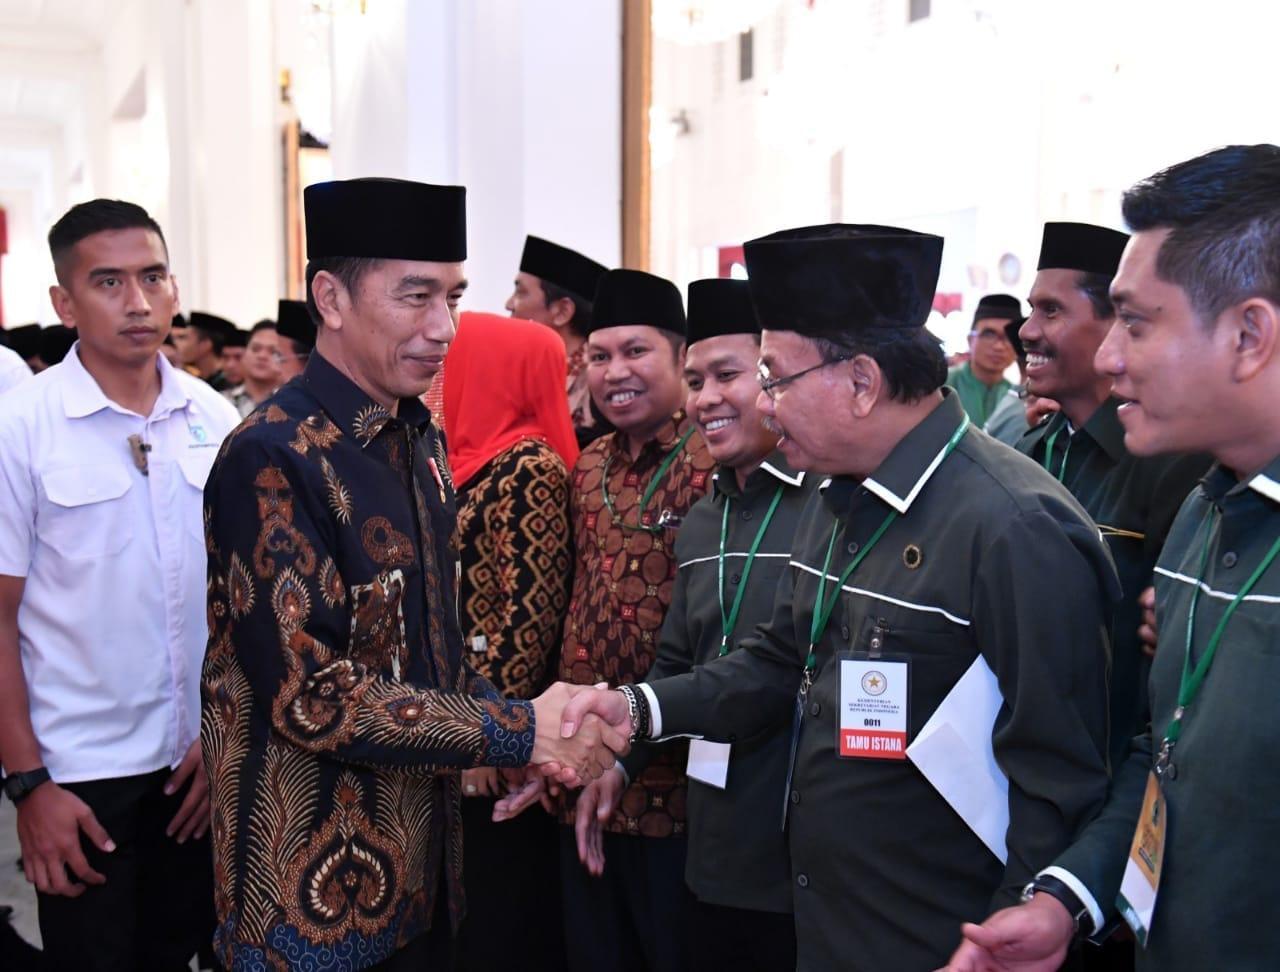 Presiden Lantik Agus Gumiwang Kartasasmita sebagai Menteri Sosial